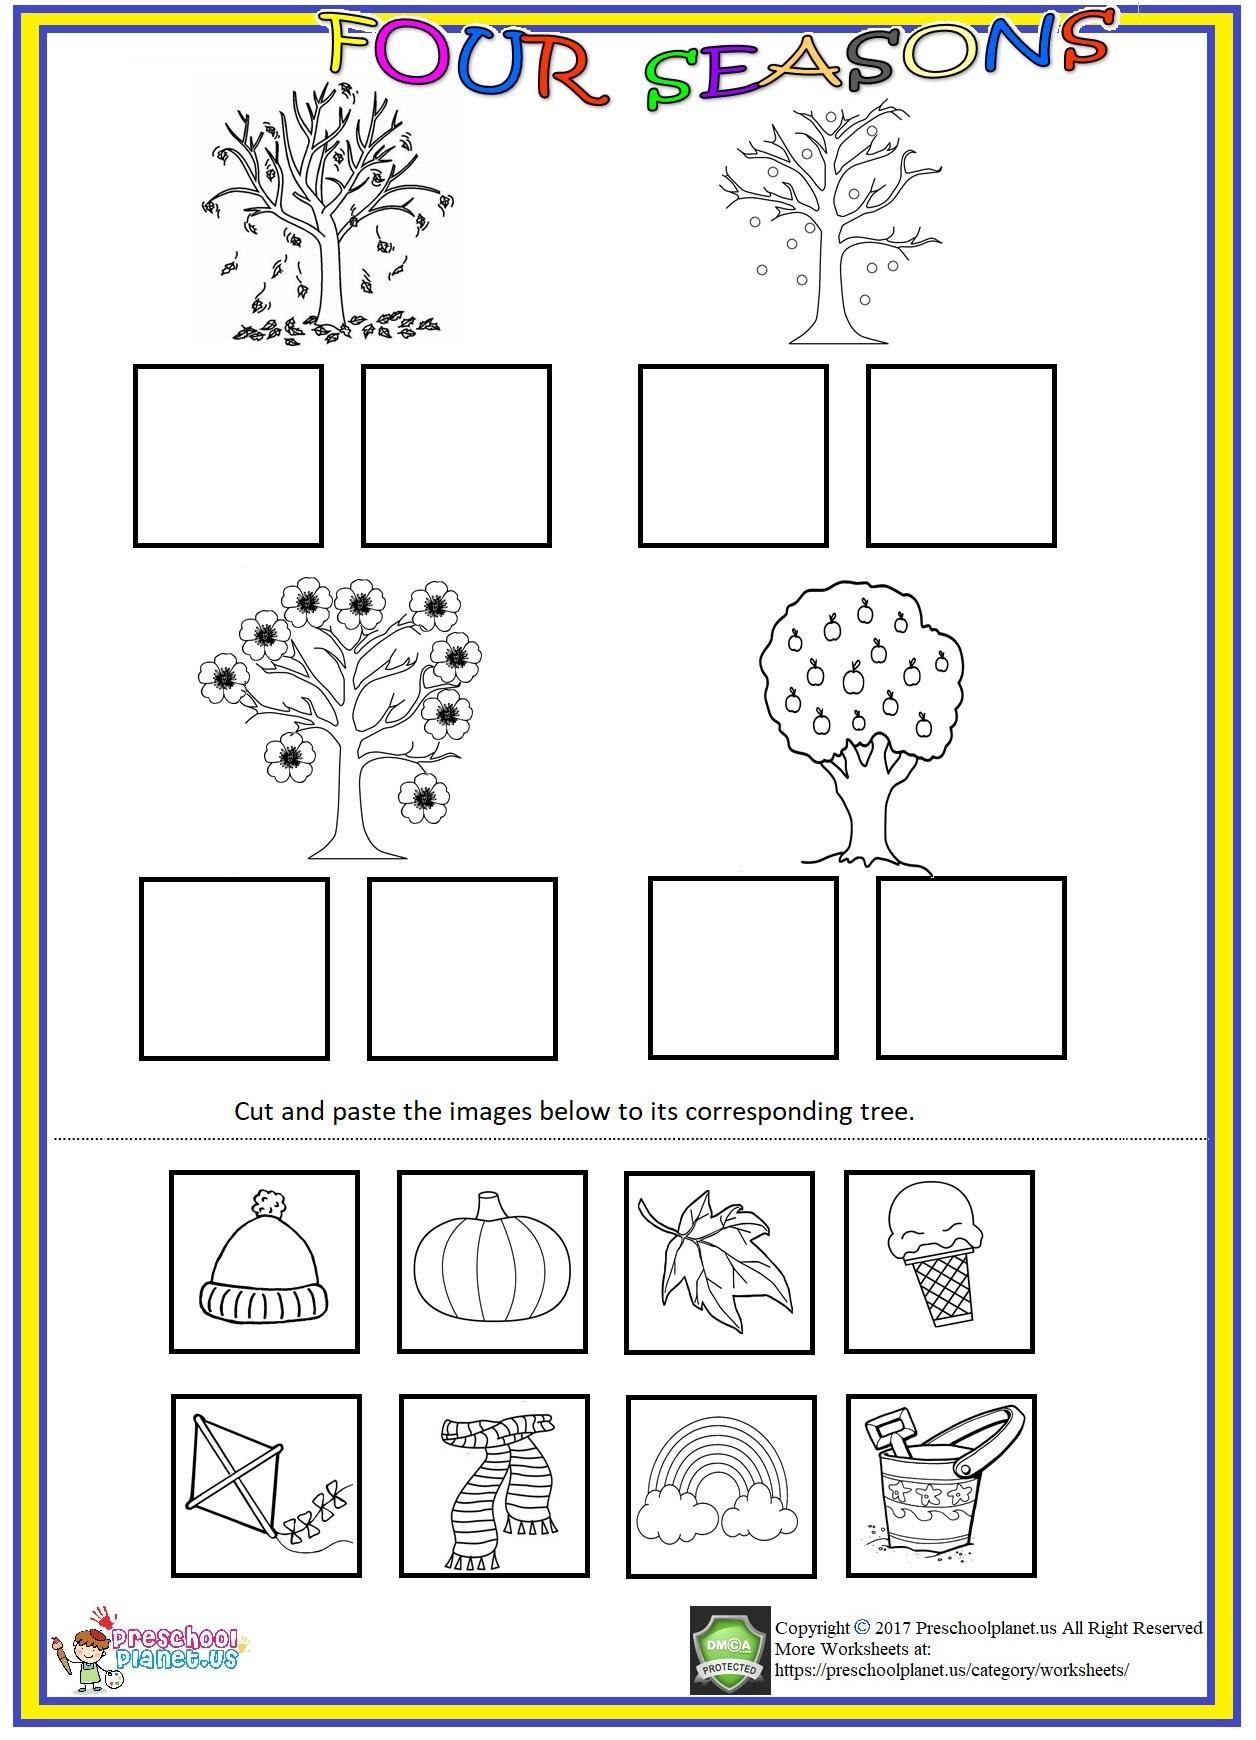 Human life cycle sequencing worksheet - Preschoolplanet